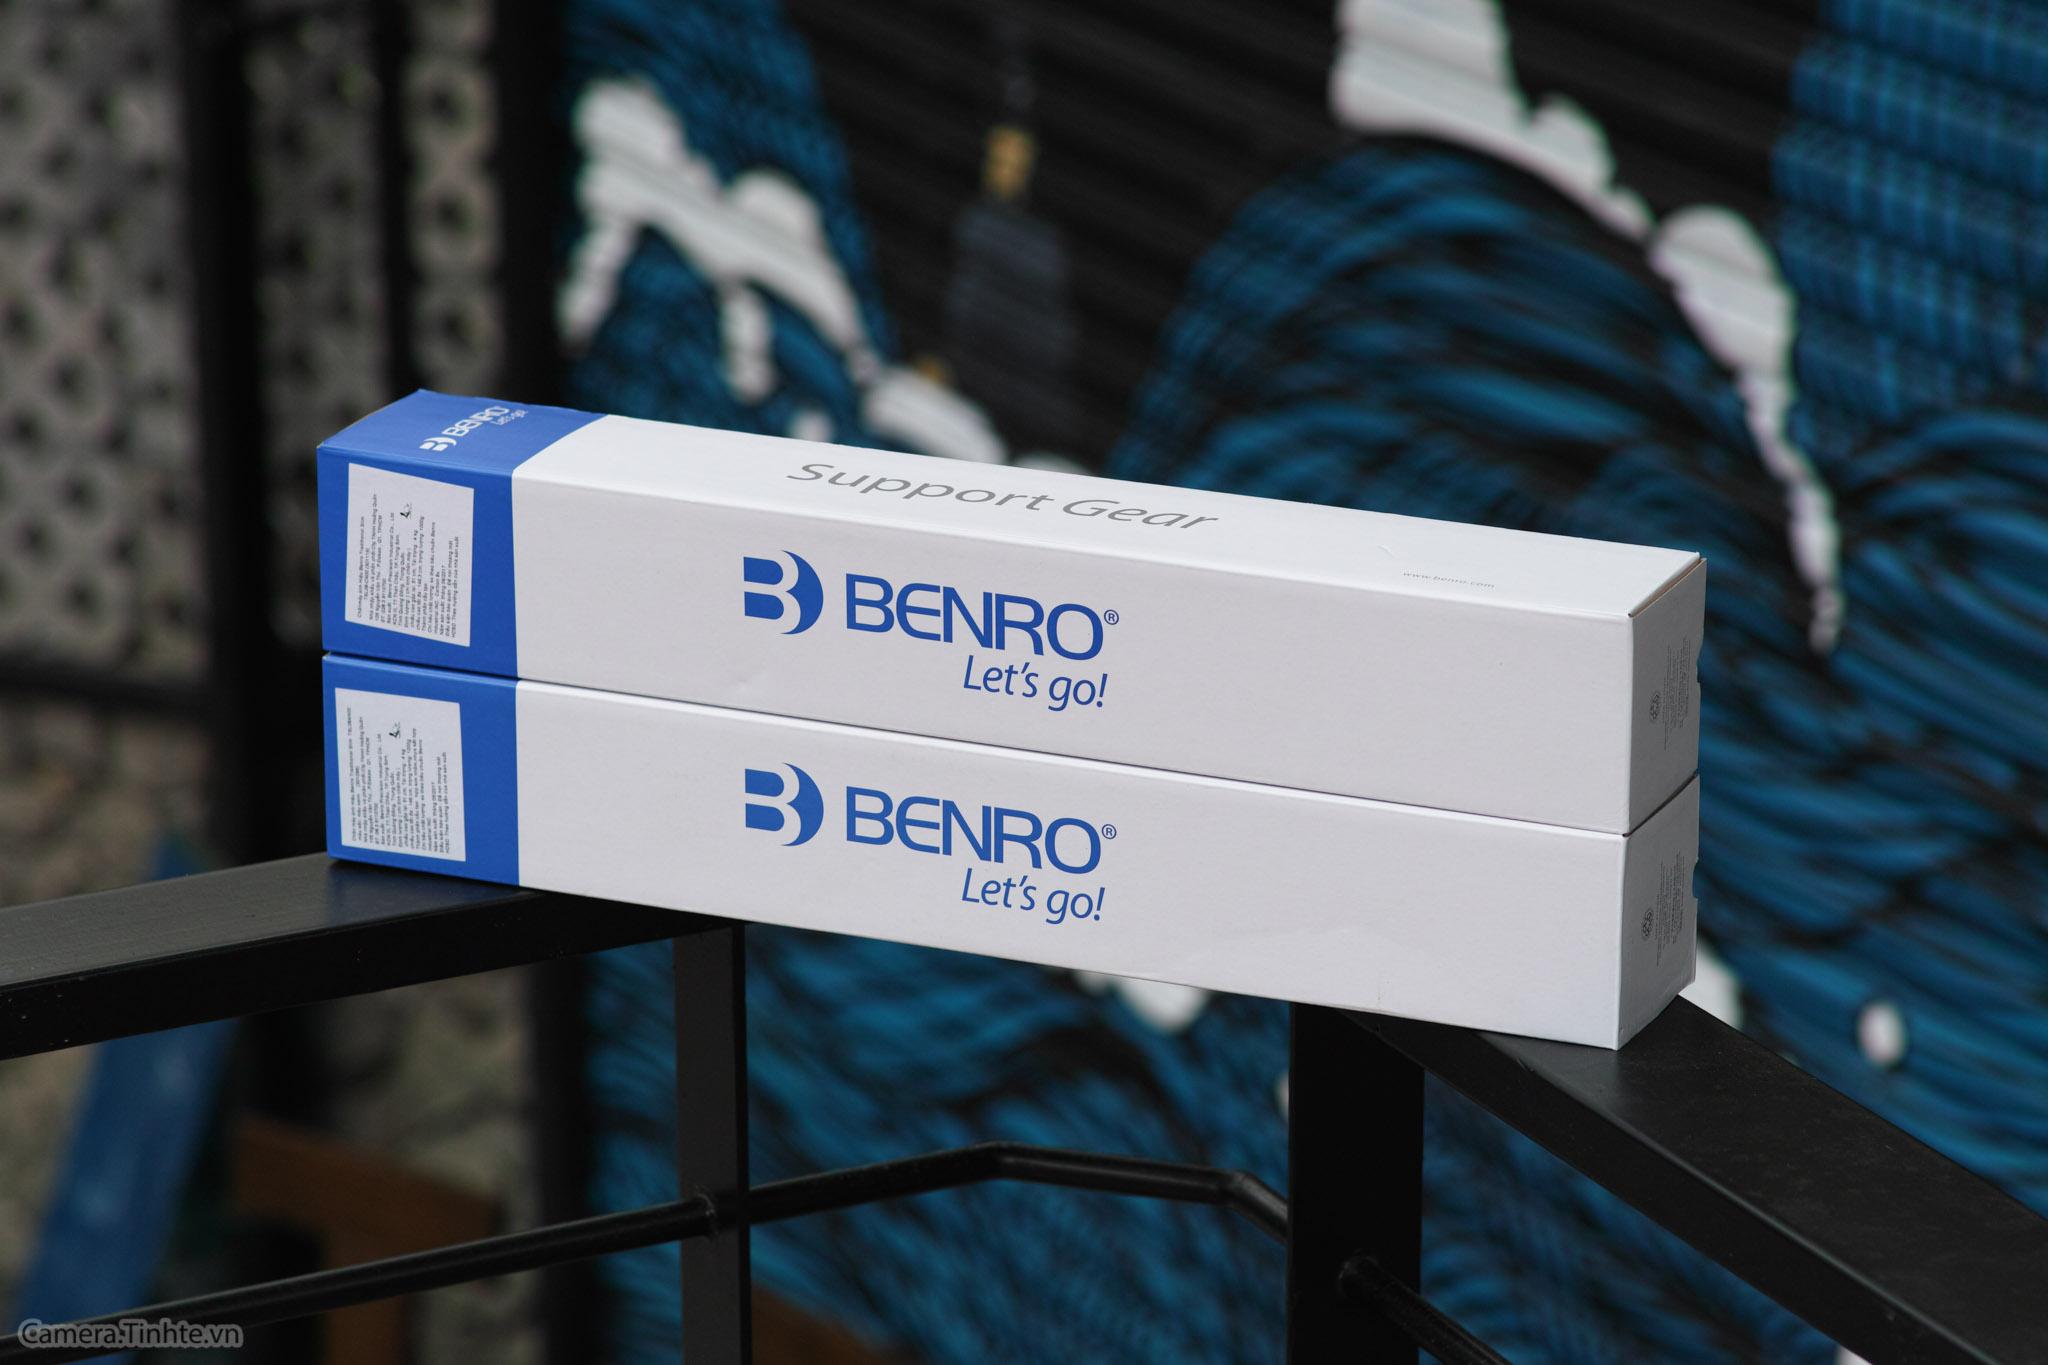 Benro-slim-tripod-5735.jpg